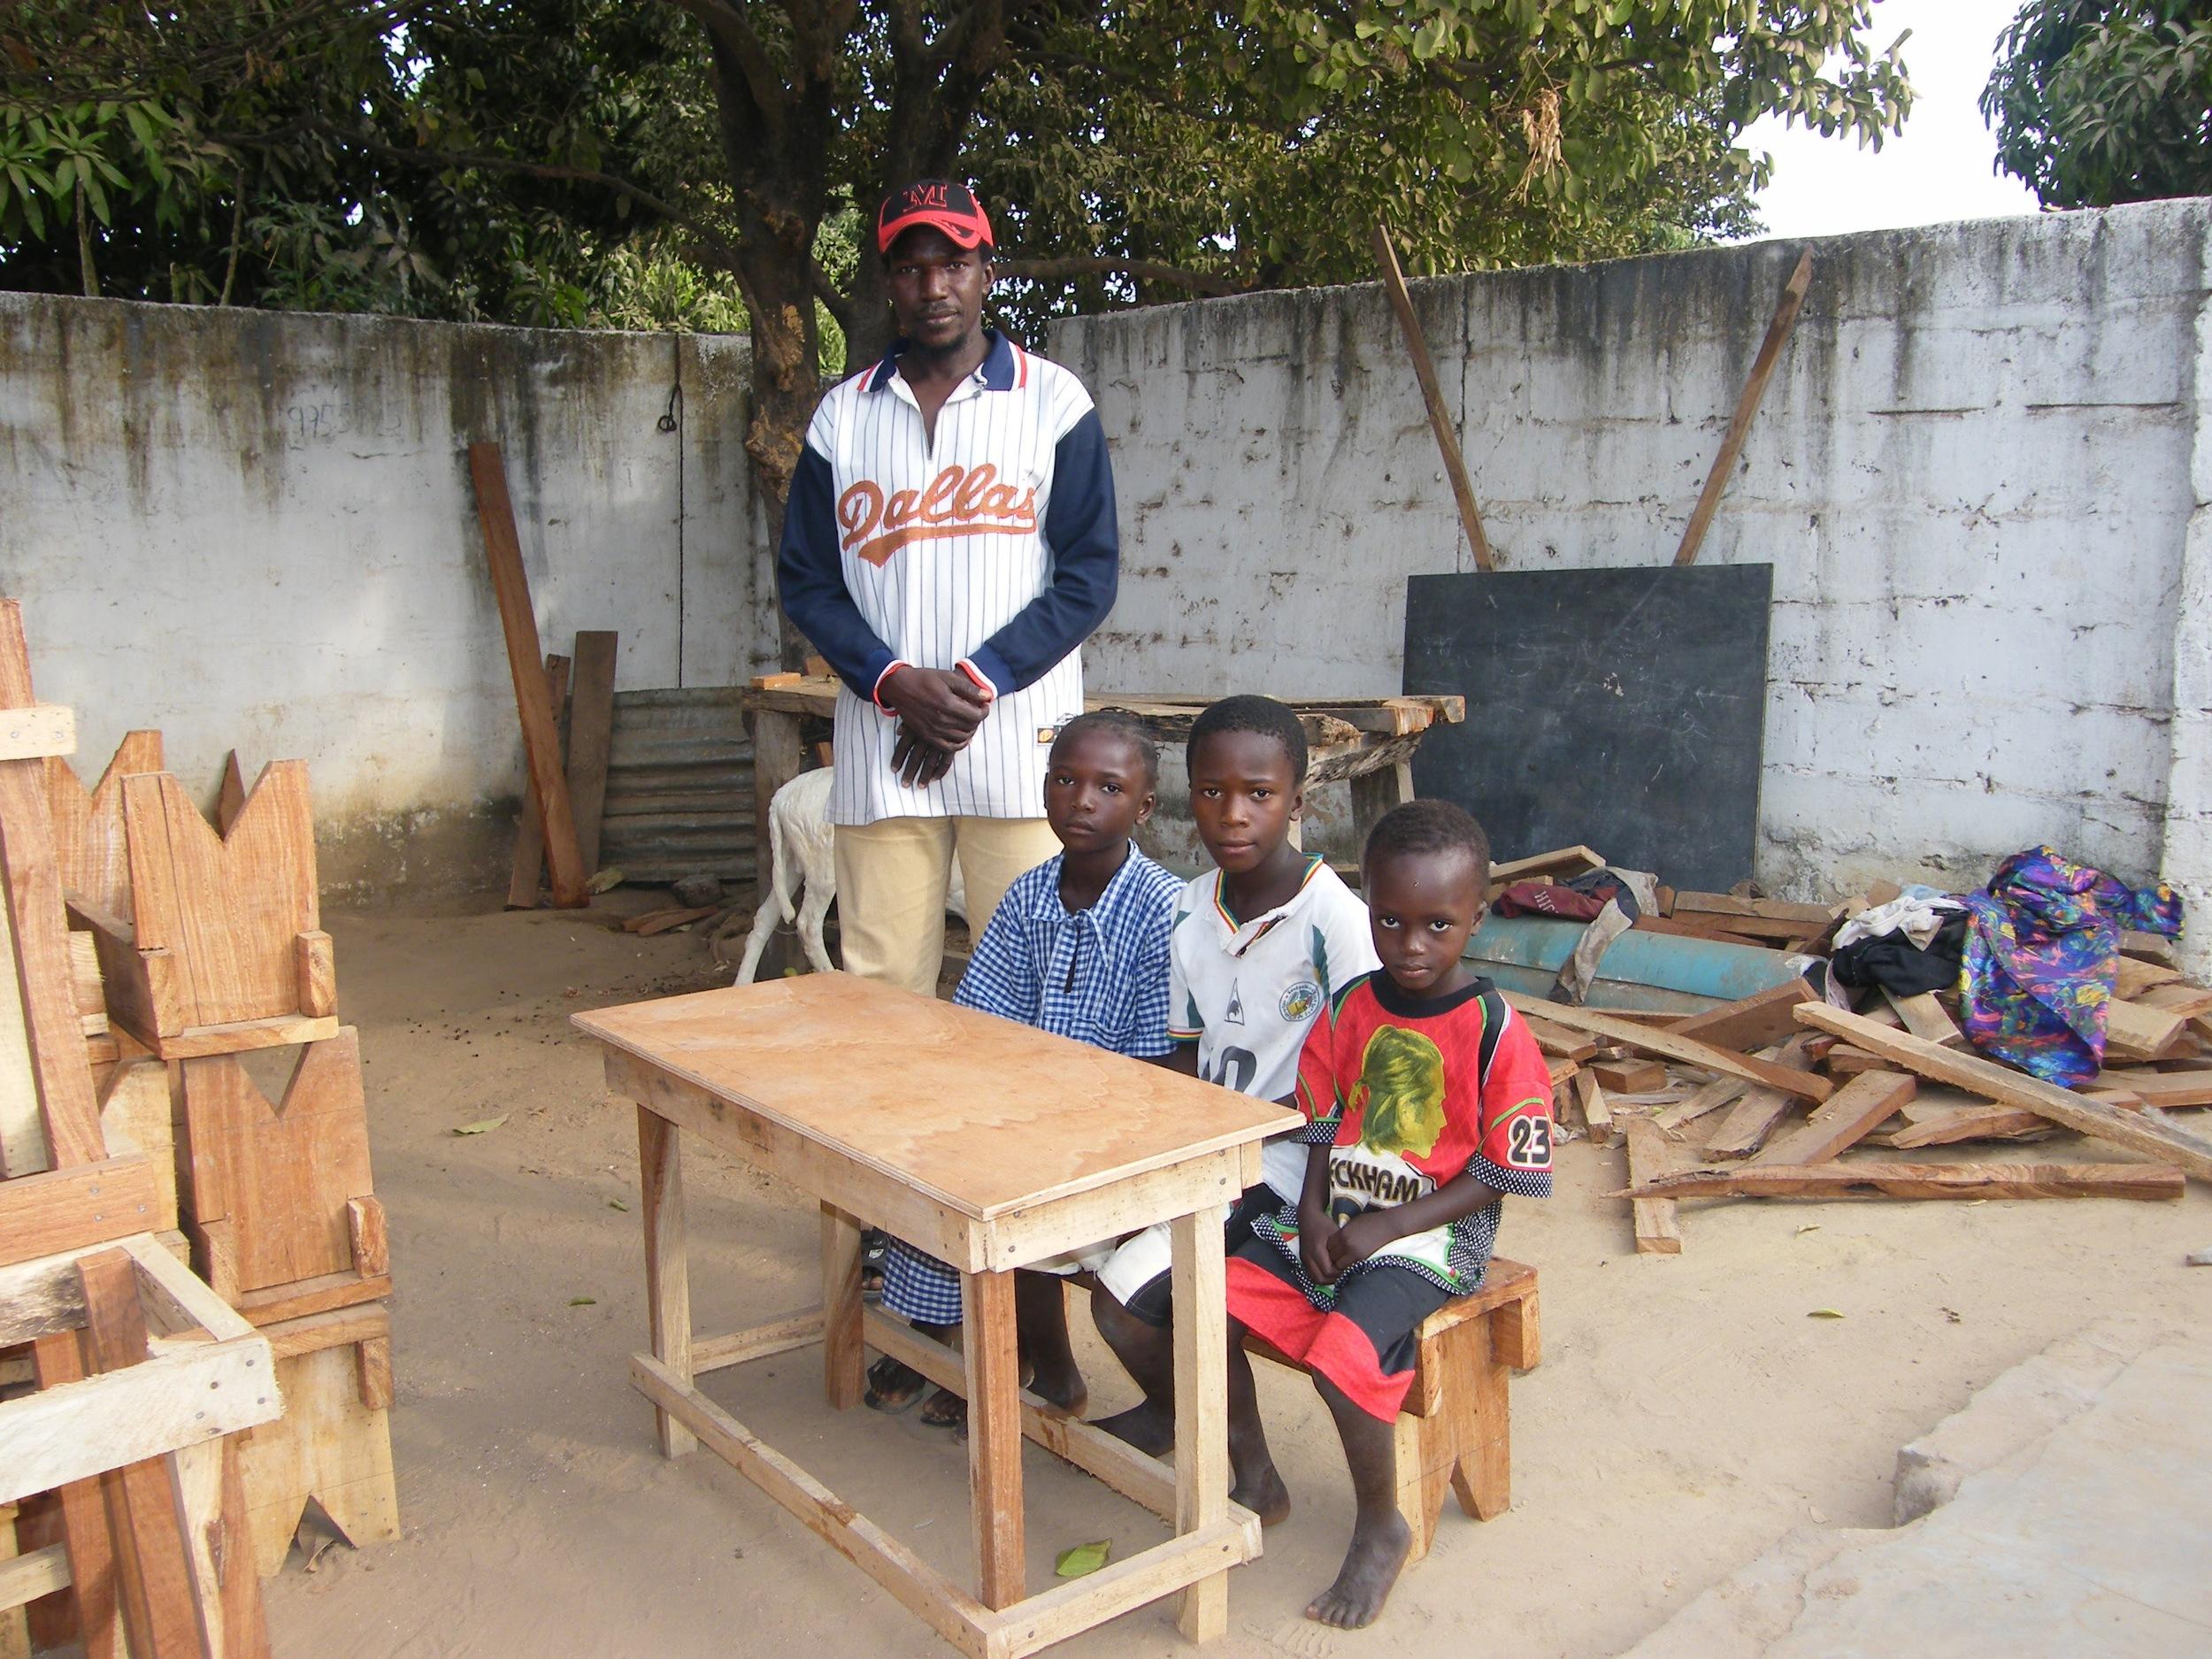 The village carpenter and his children